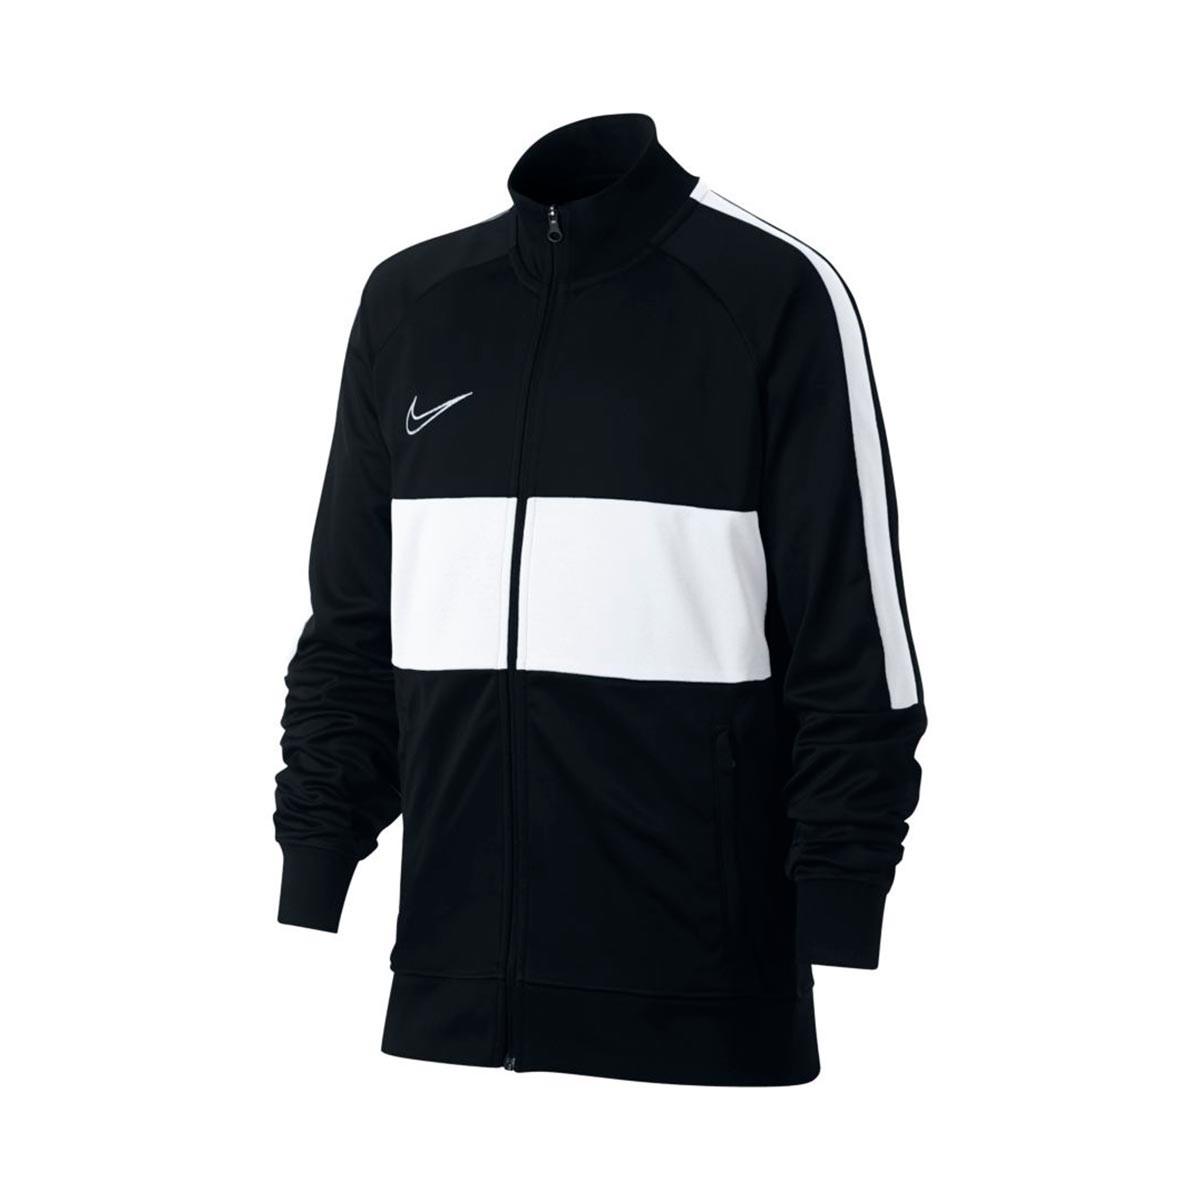 Casaco Nike Dri FIT Academy Niño Black White Loja de